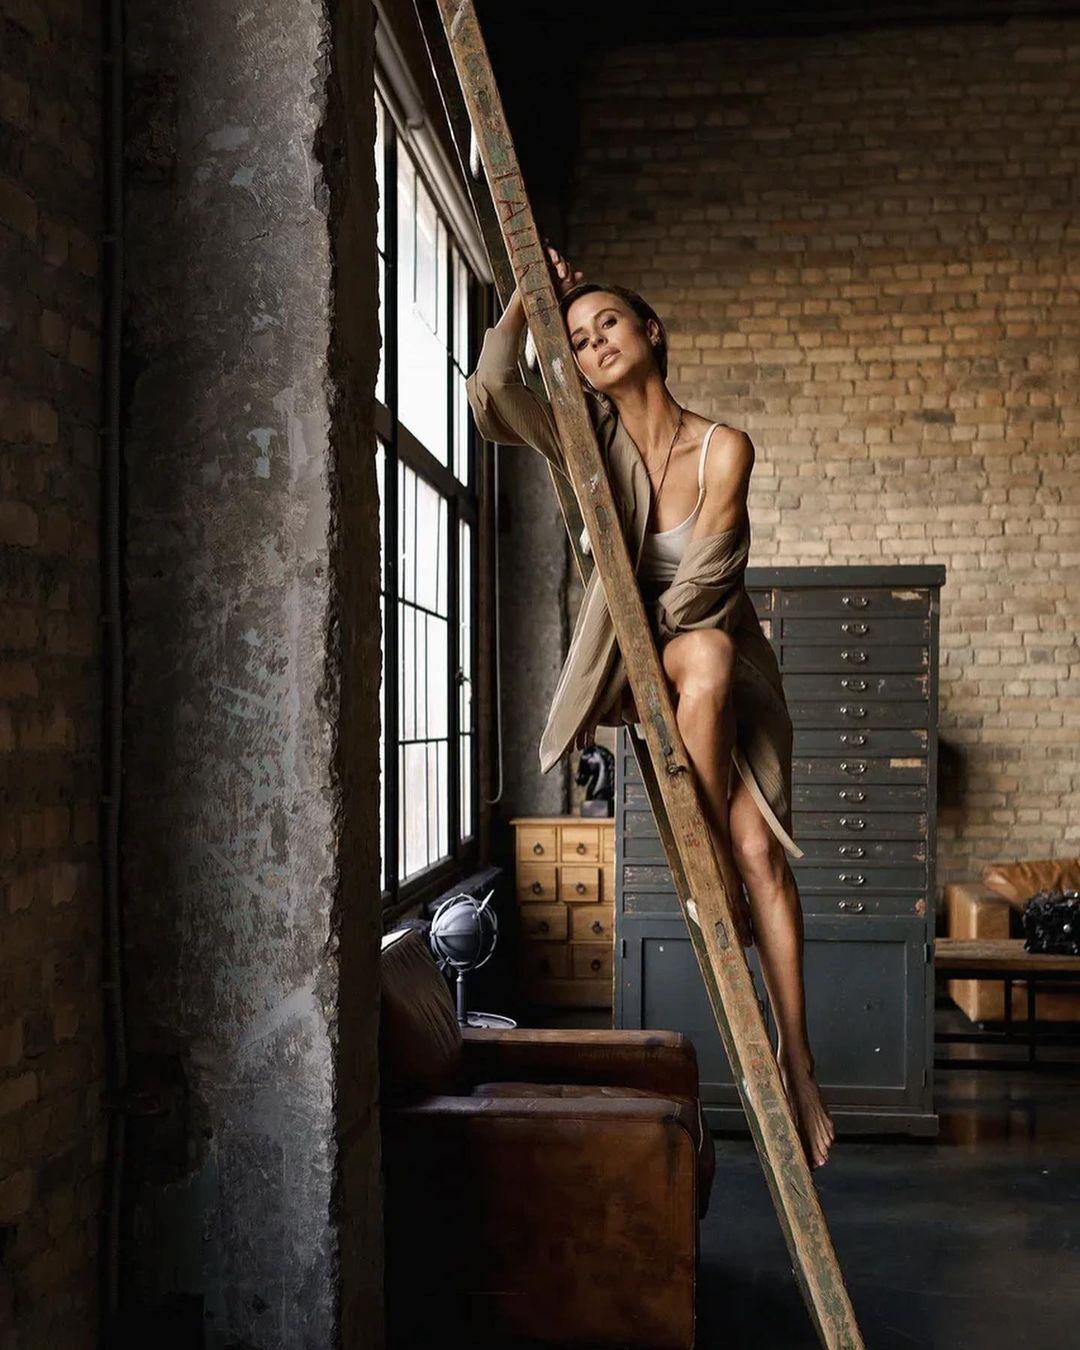 Miroslava Karpovich starred in a sensual photo shoot hugging the stairs